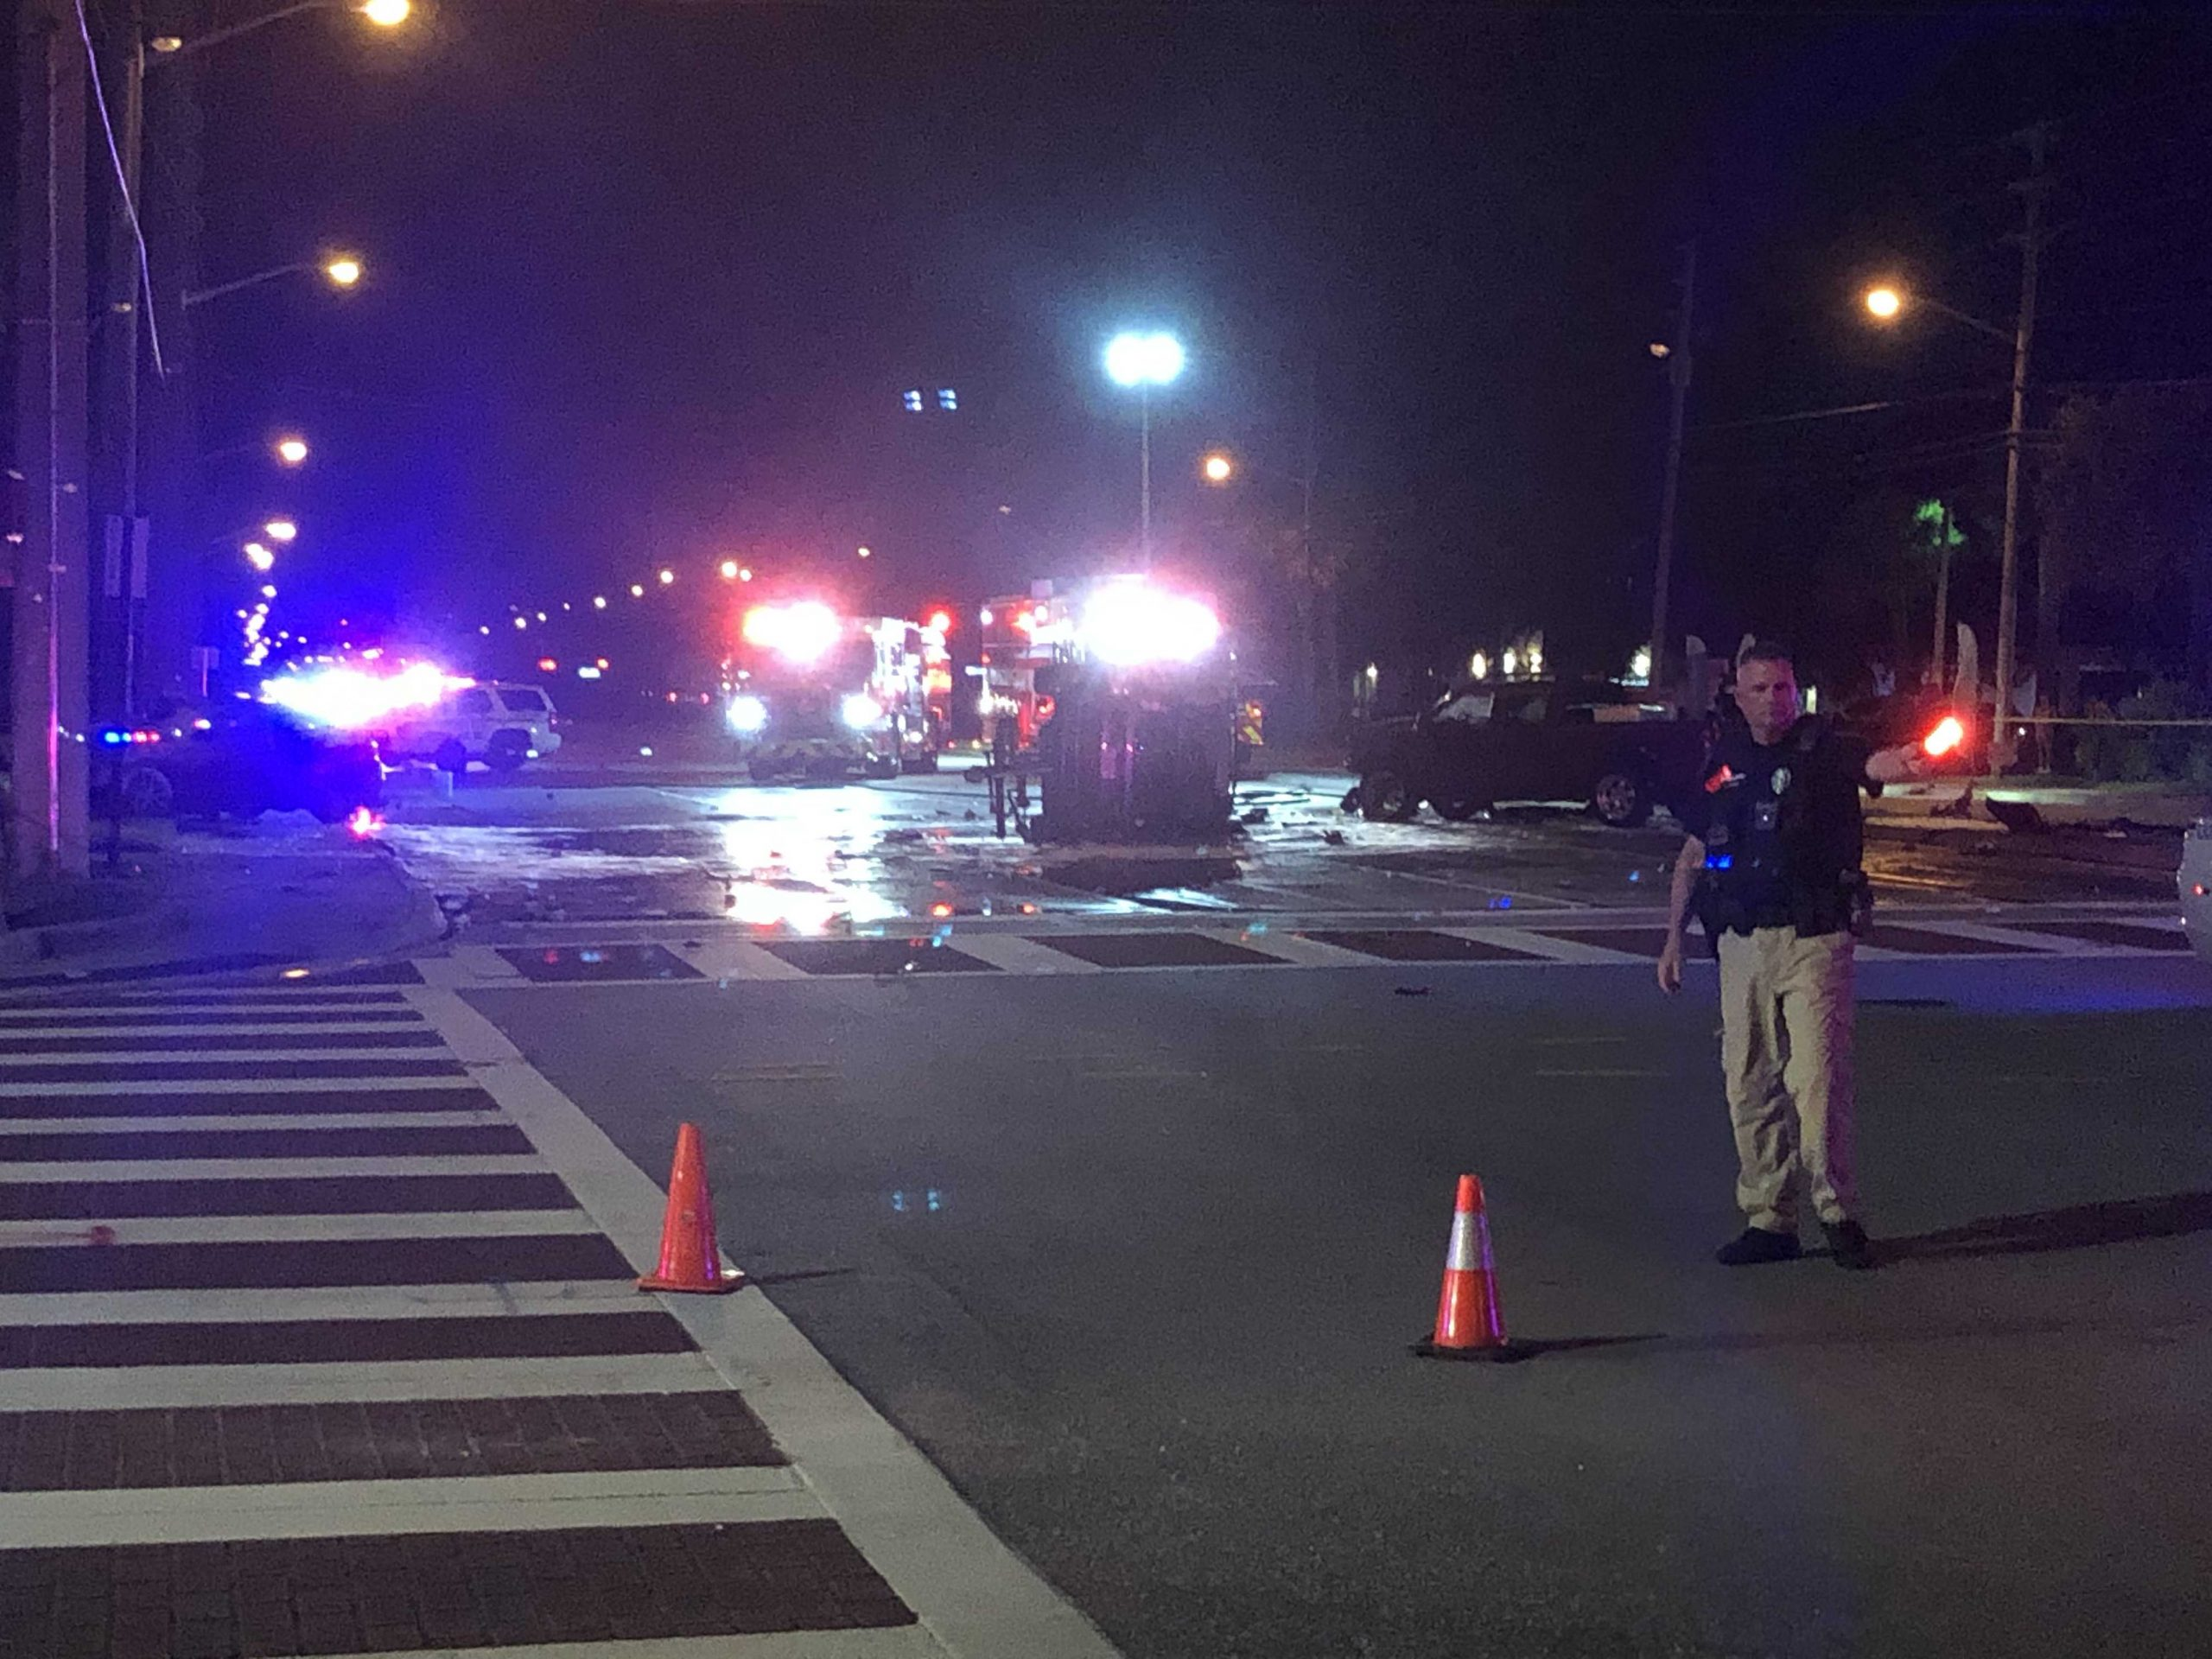 Eight injured after major accident in Jupiter